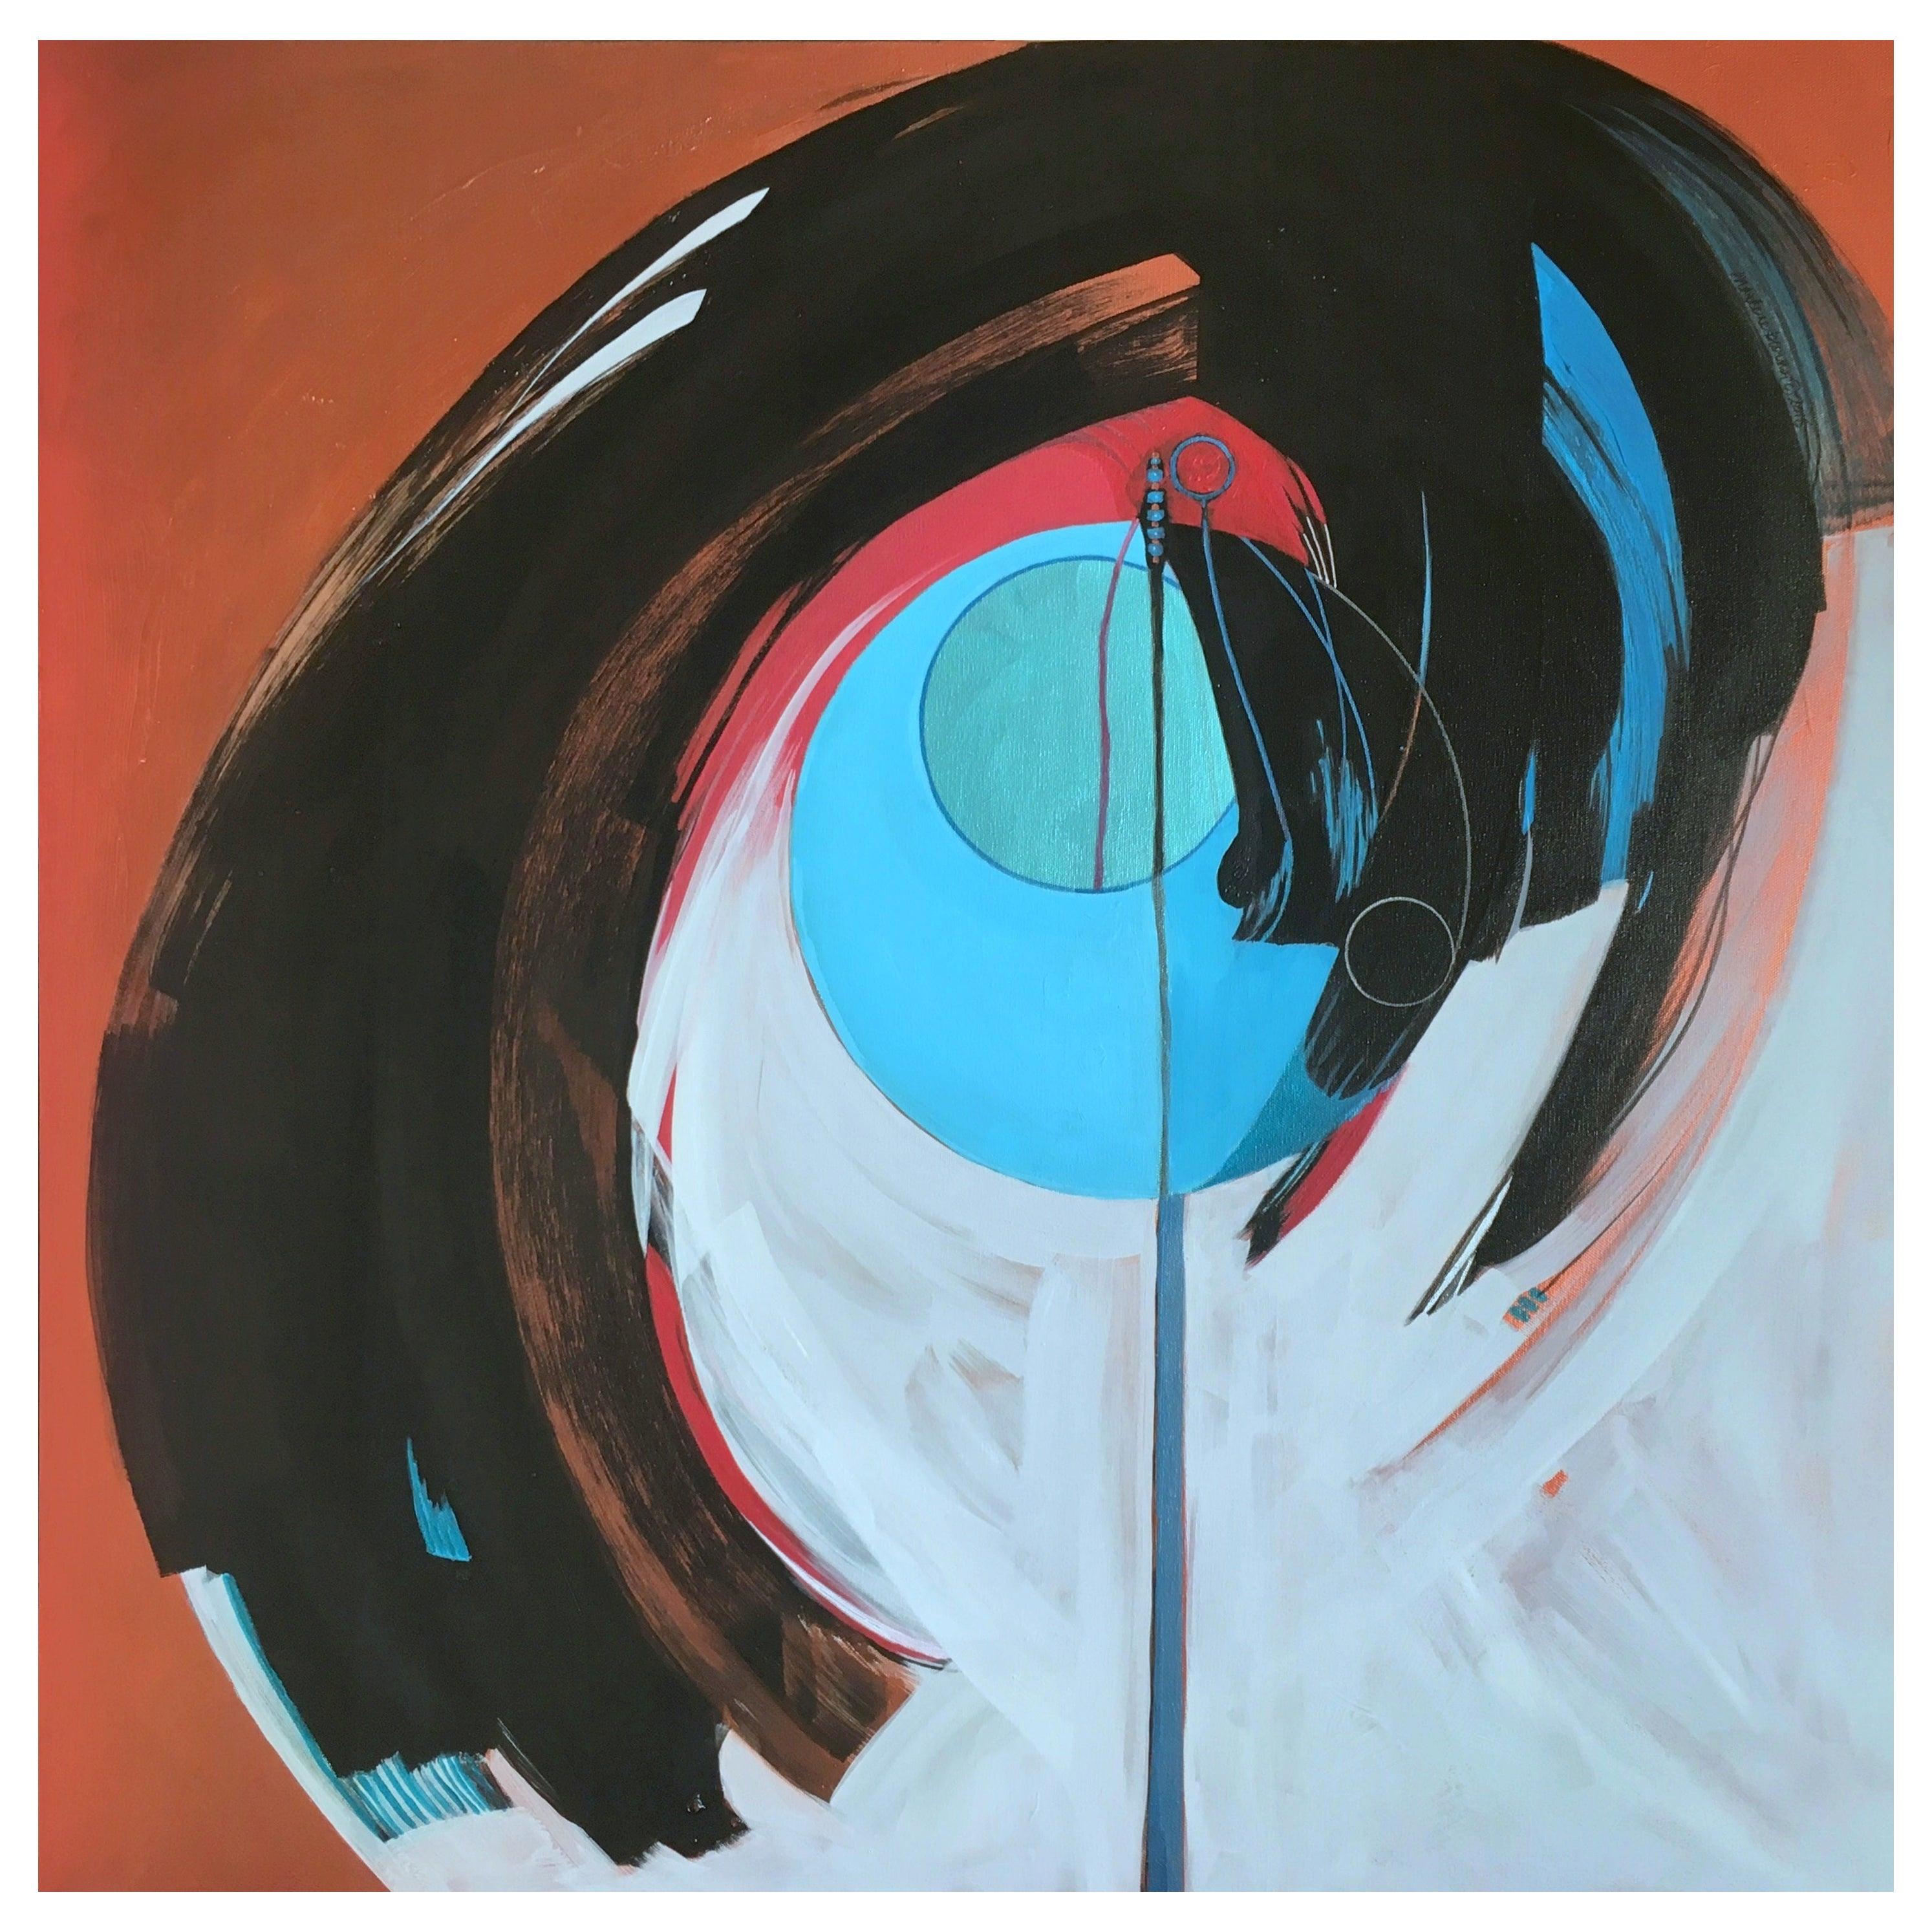 Marlene Burns Modern Abstract Acrylic Mixed-Media Painting Titled Eddy, 2018